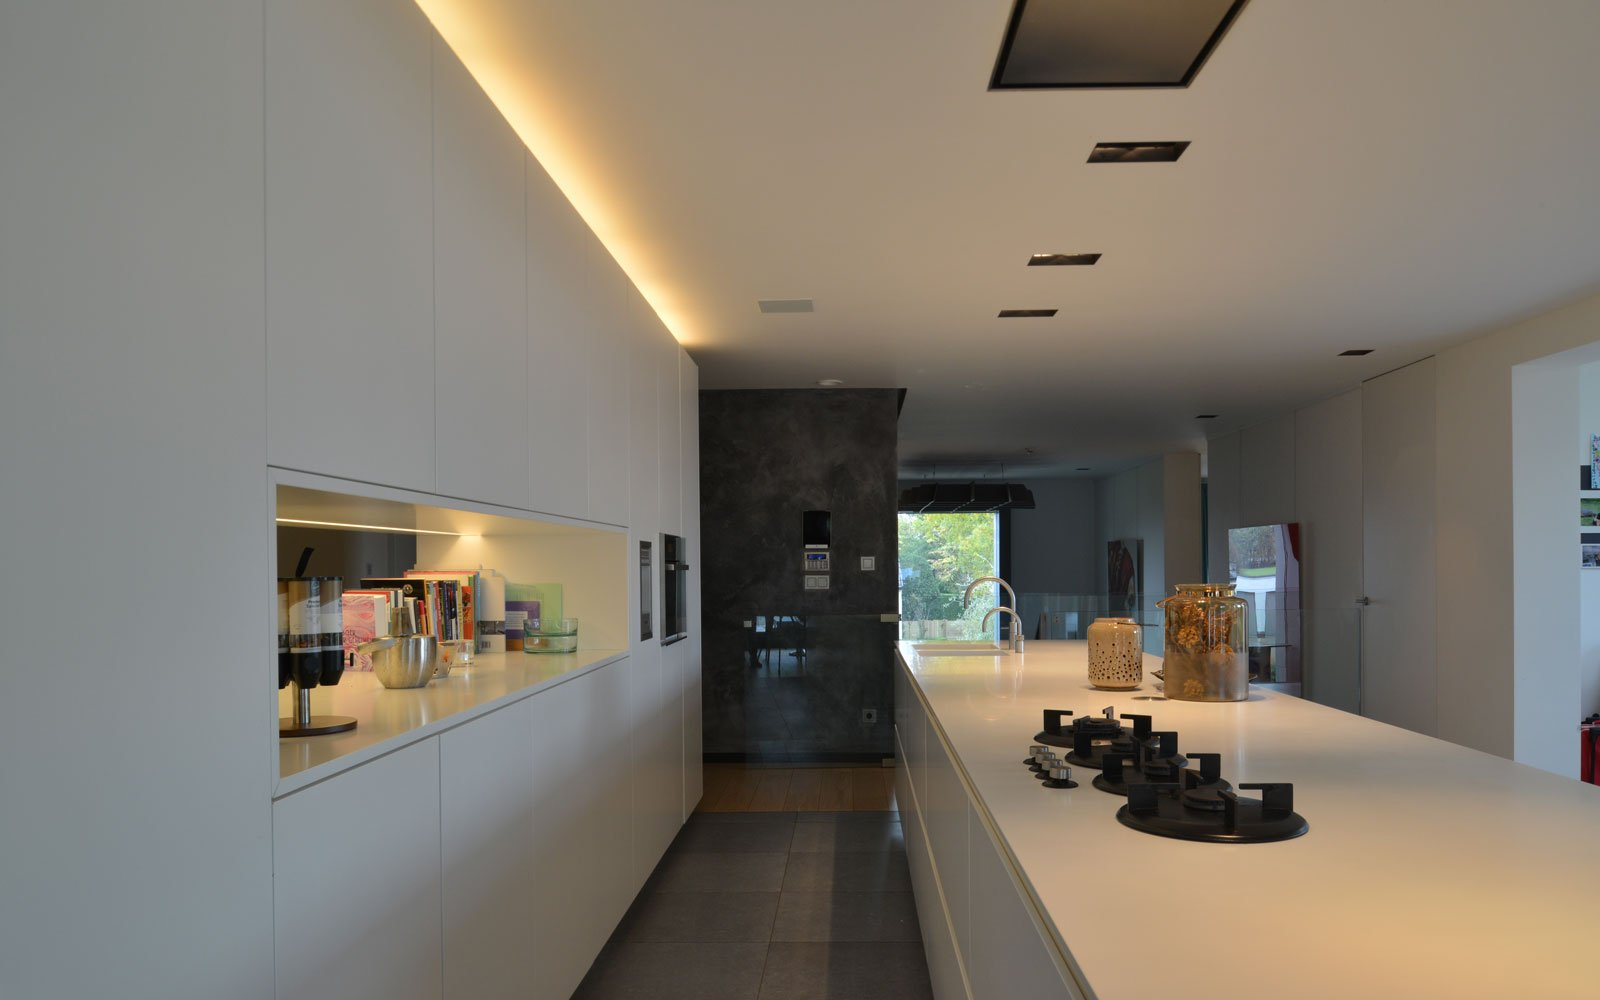 Strakke, witte keuken, maatwerk, Vado Keukens, moderne villa, VVR Architecten